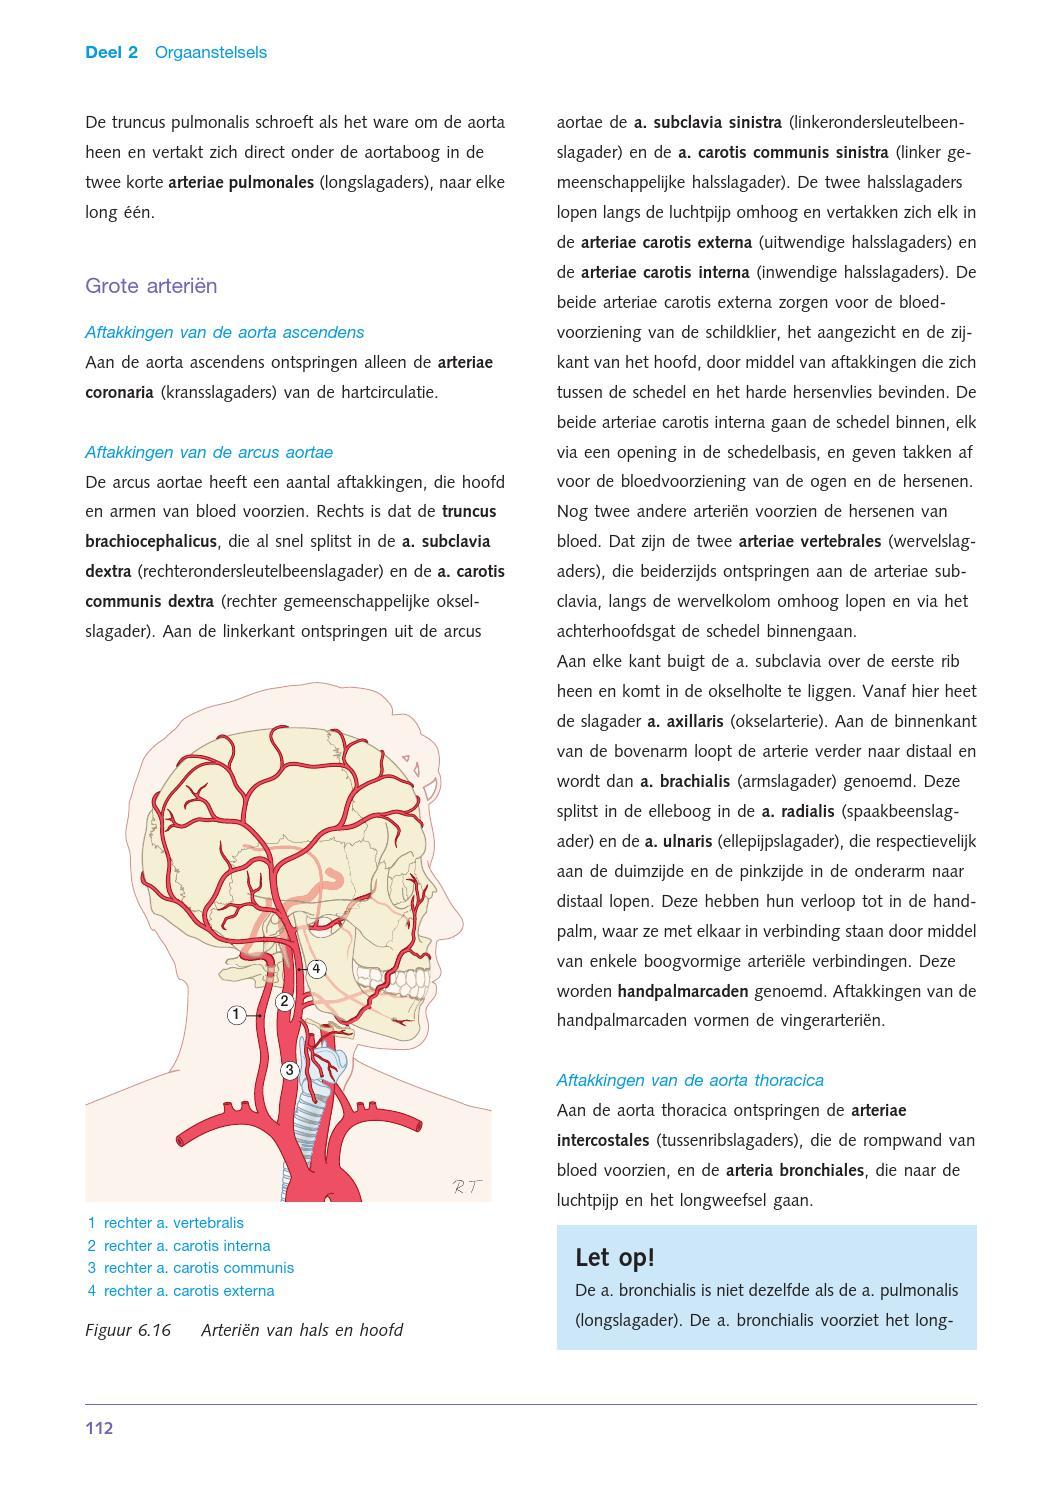 Anatomie en fysiologie van de mens by ThiemeMeulenhoff - issuu